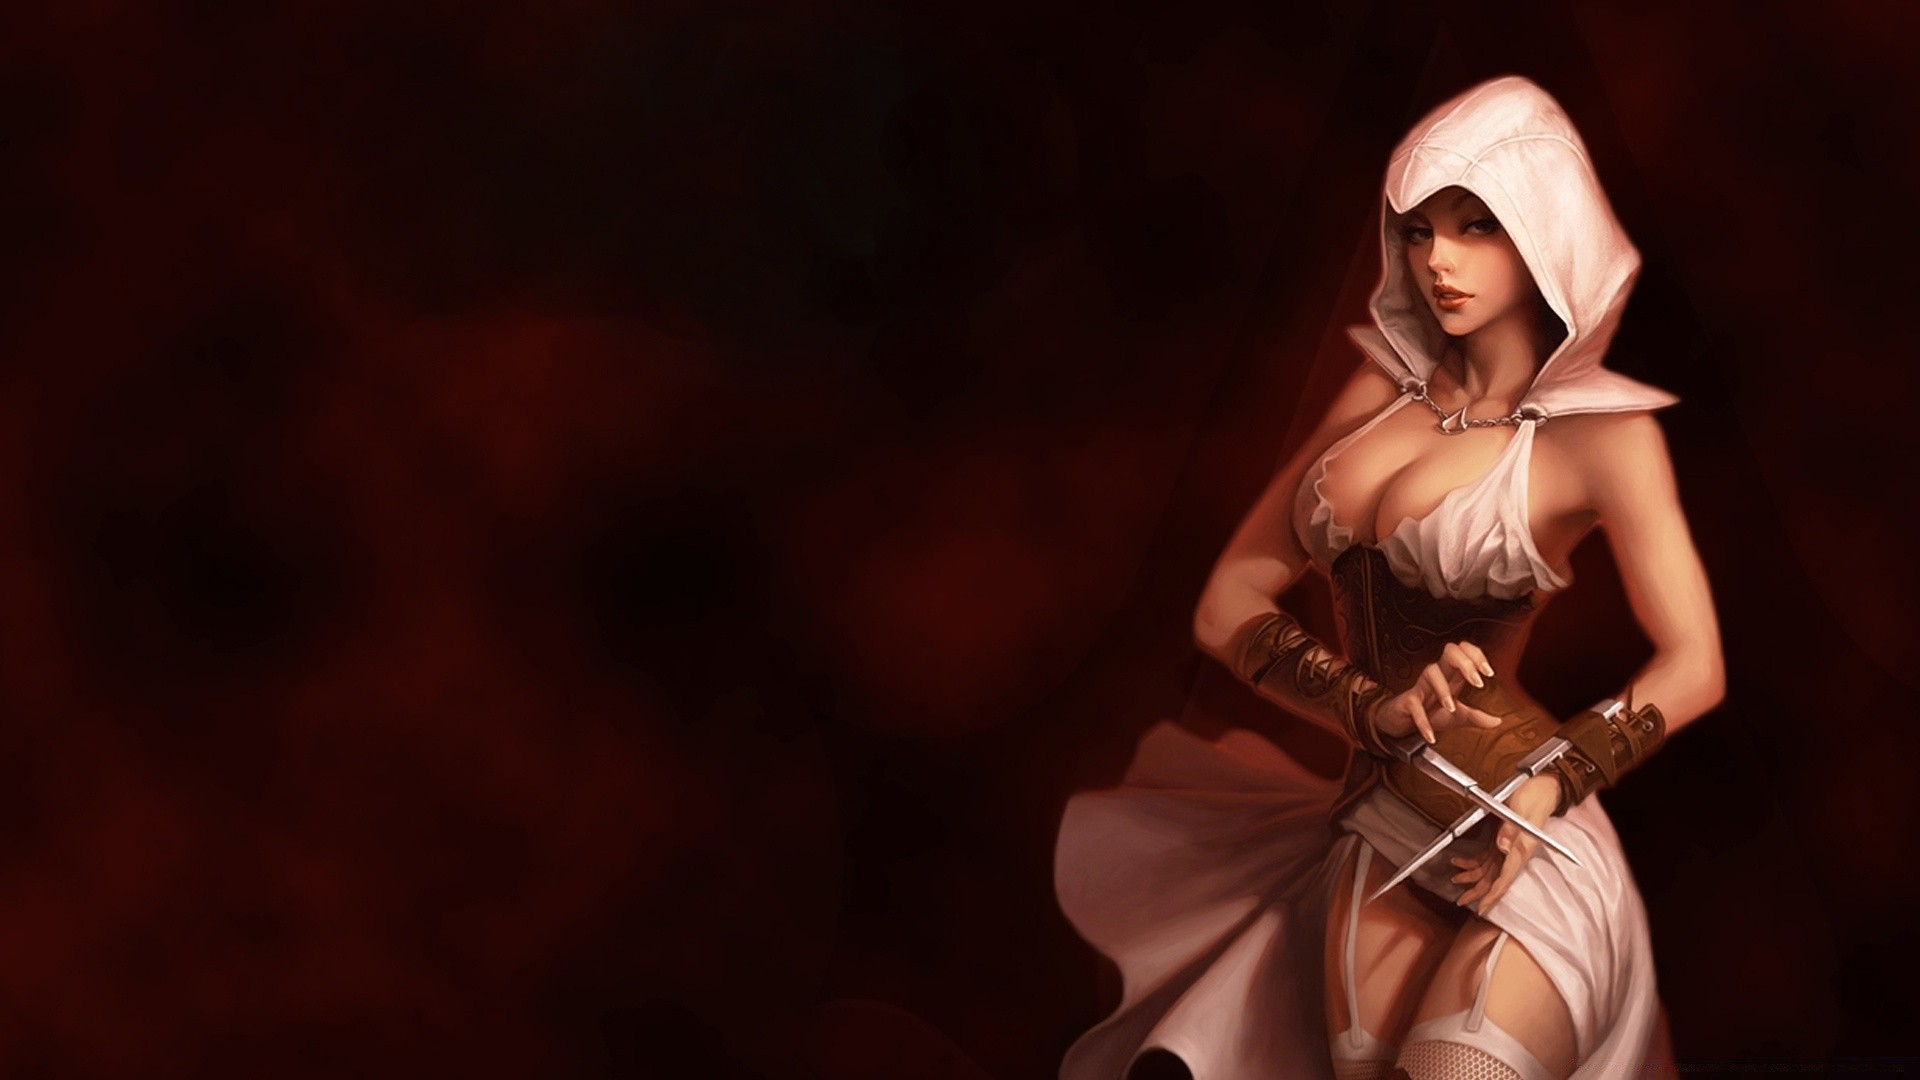 Assassins creed pron erotic movie